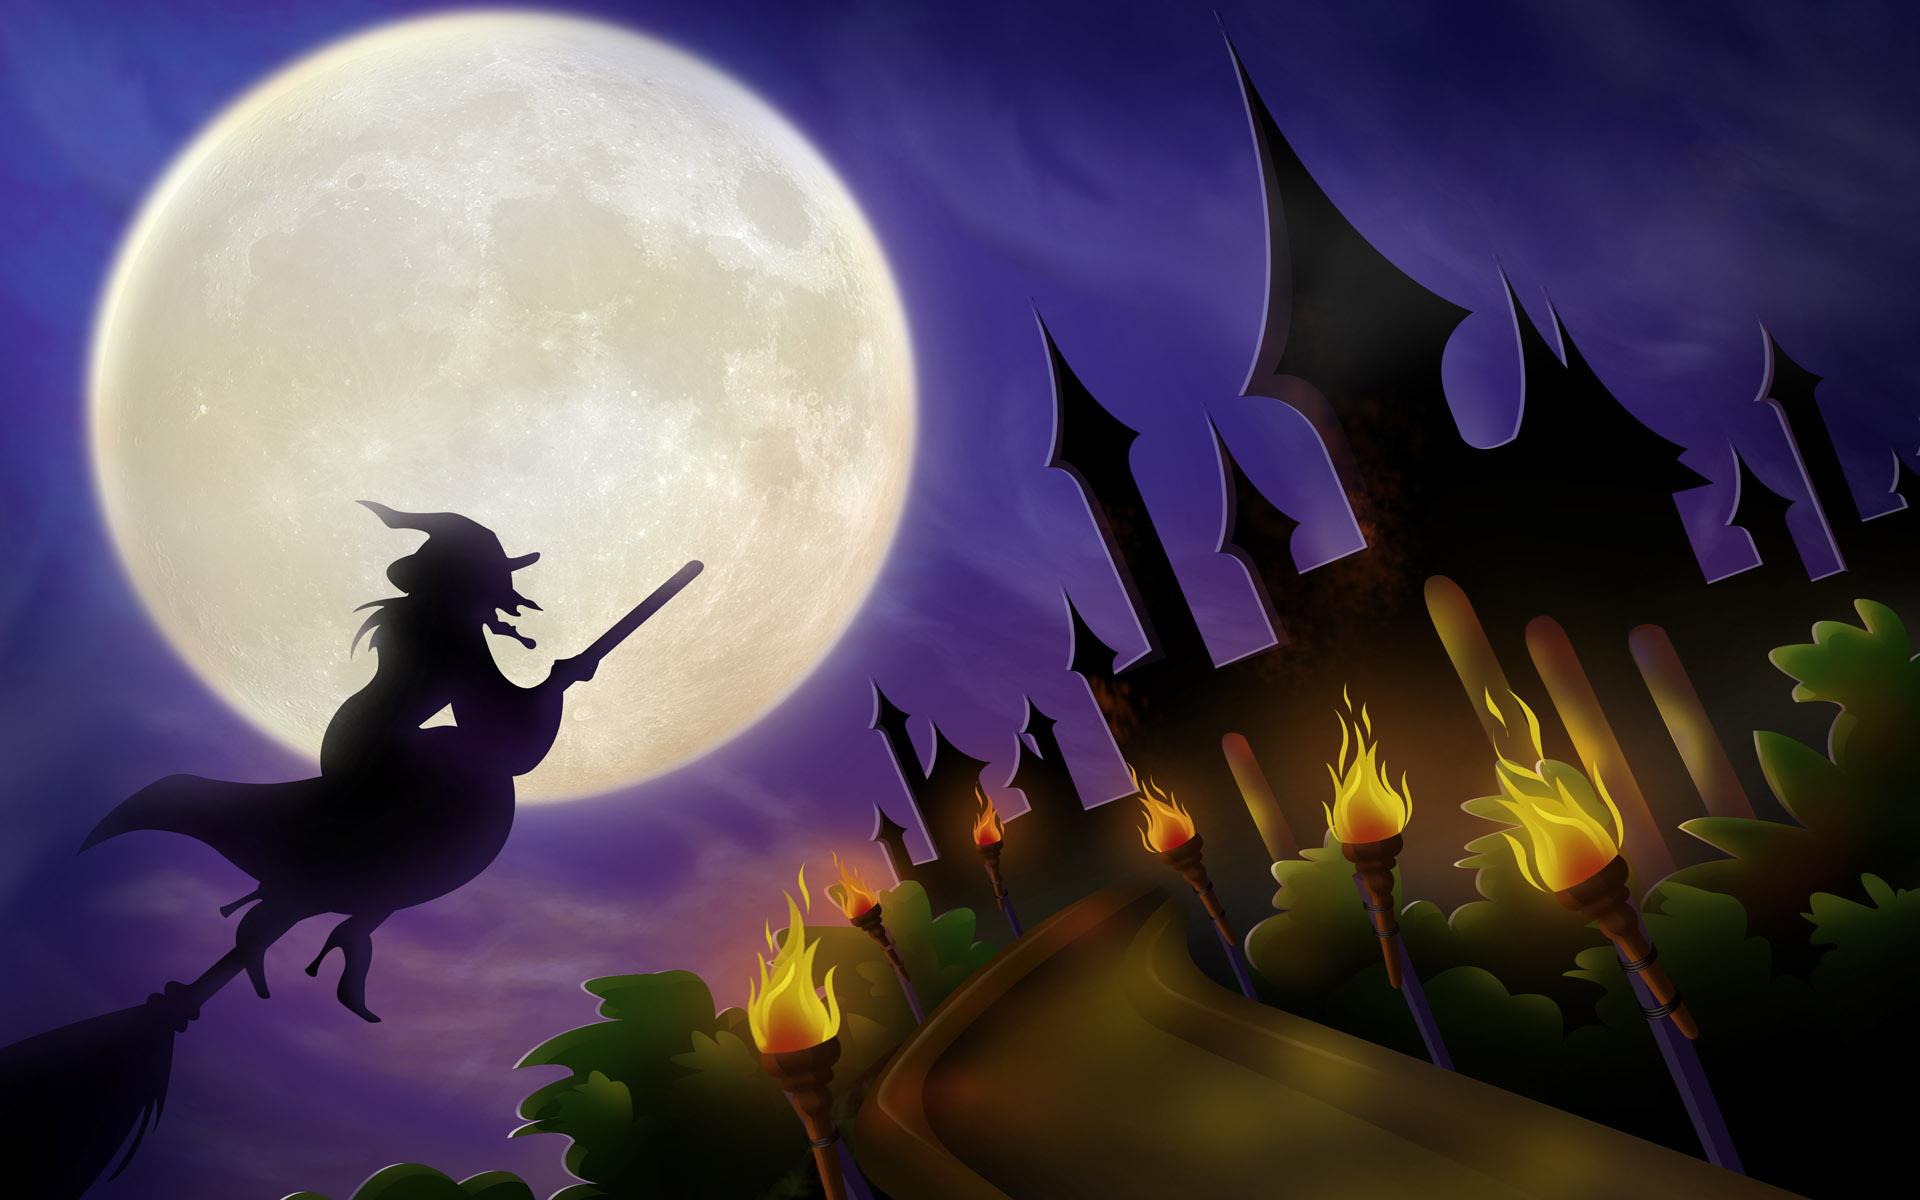 Download Wallpaper Halloween Purple - witch-on-a-broom-wallpapers_11250_1920x1200  HD_913081.jpg